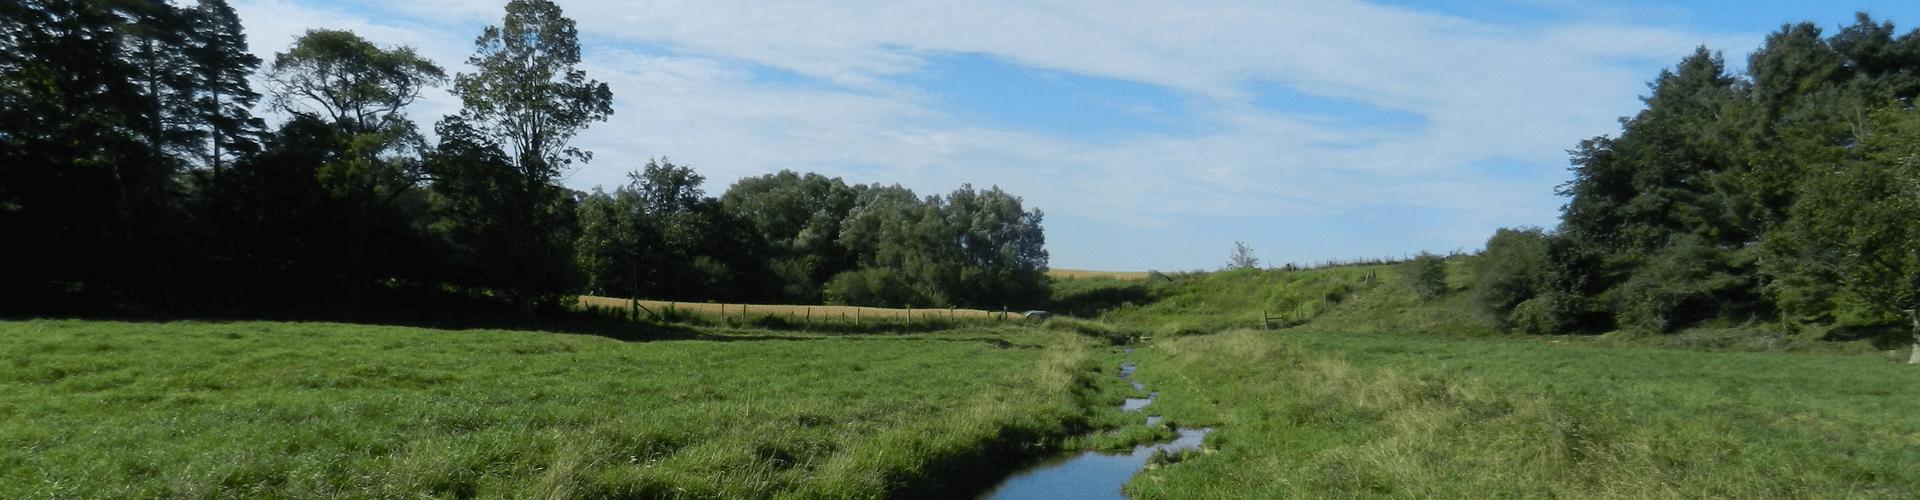 stream running through a field